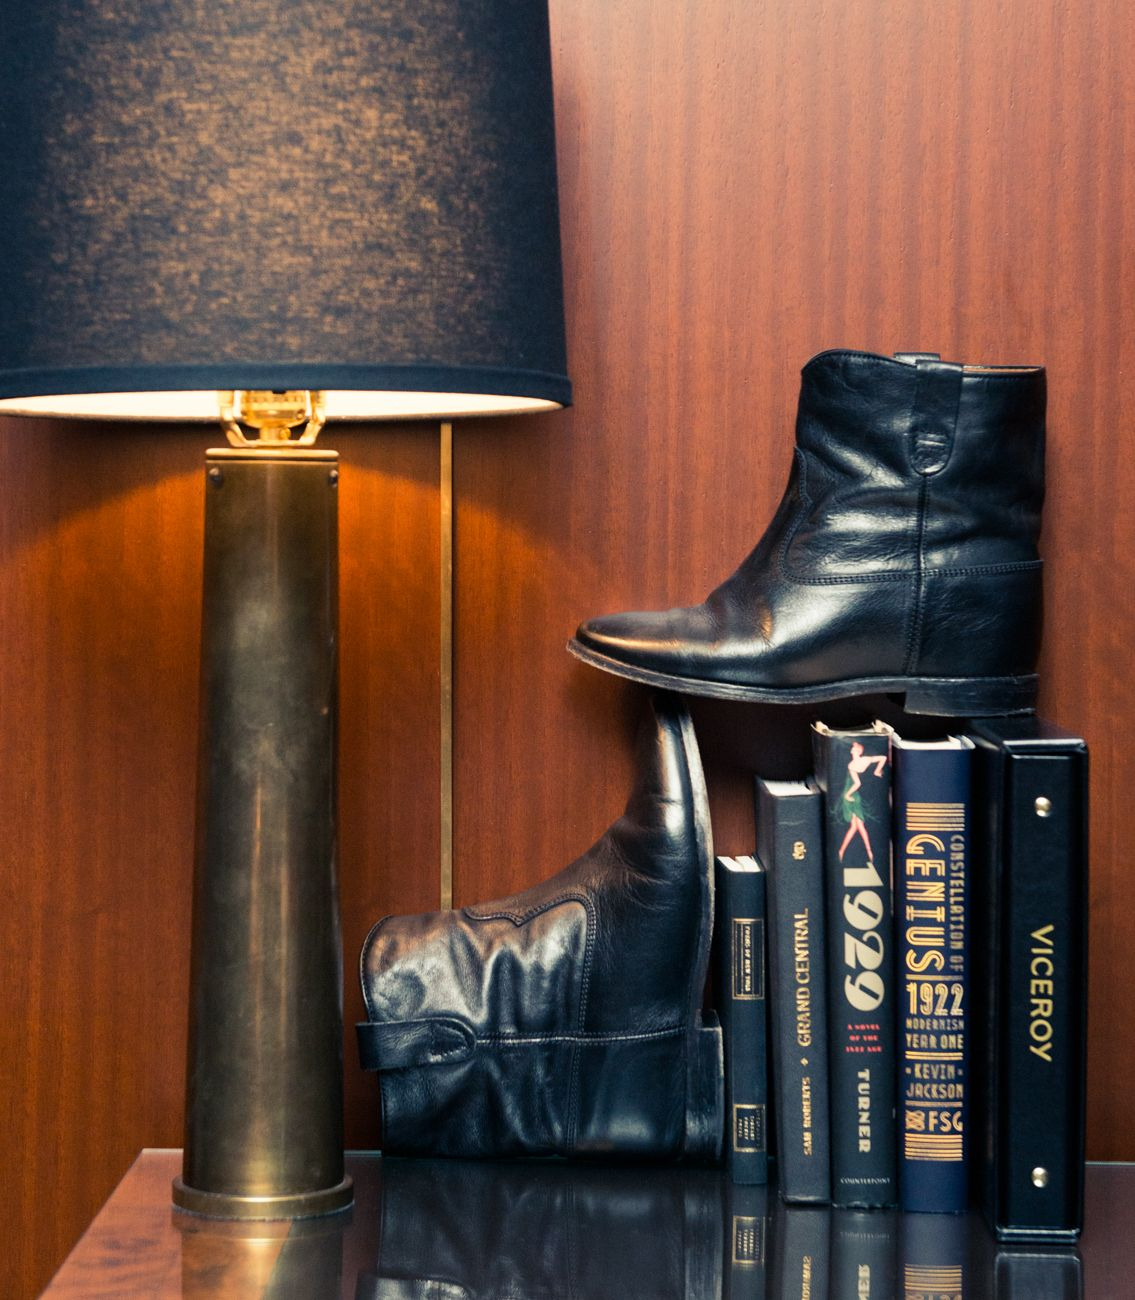 Phoebe Tonkin Phoebe tonkin, Boots, Fashion shoes